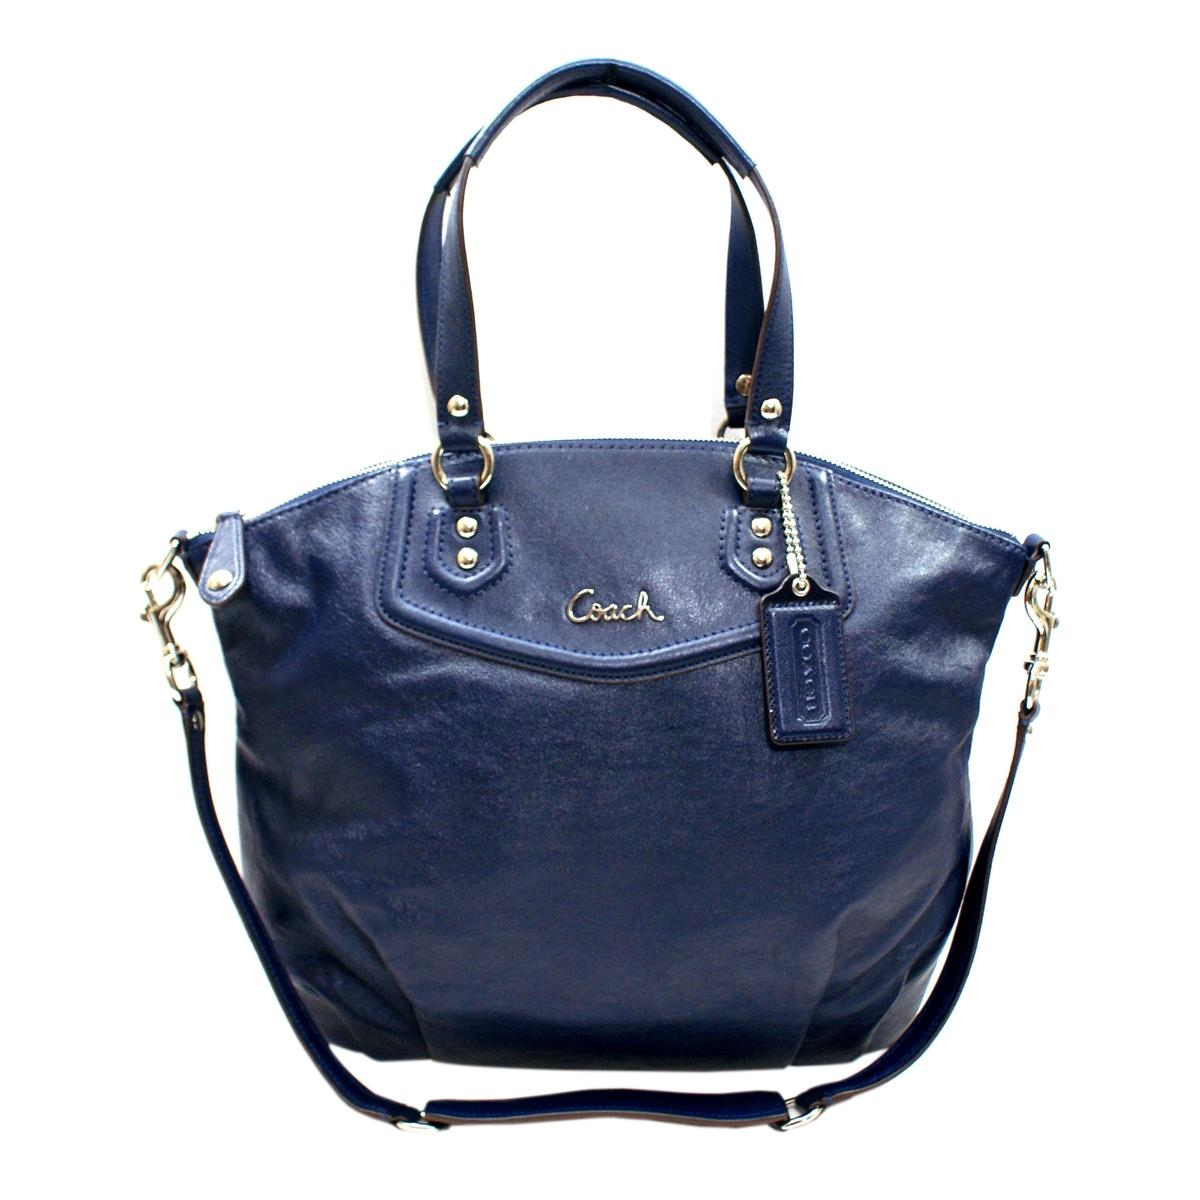 Coach Ashley Leather Satchel Shoulder Bag Midnight Navy